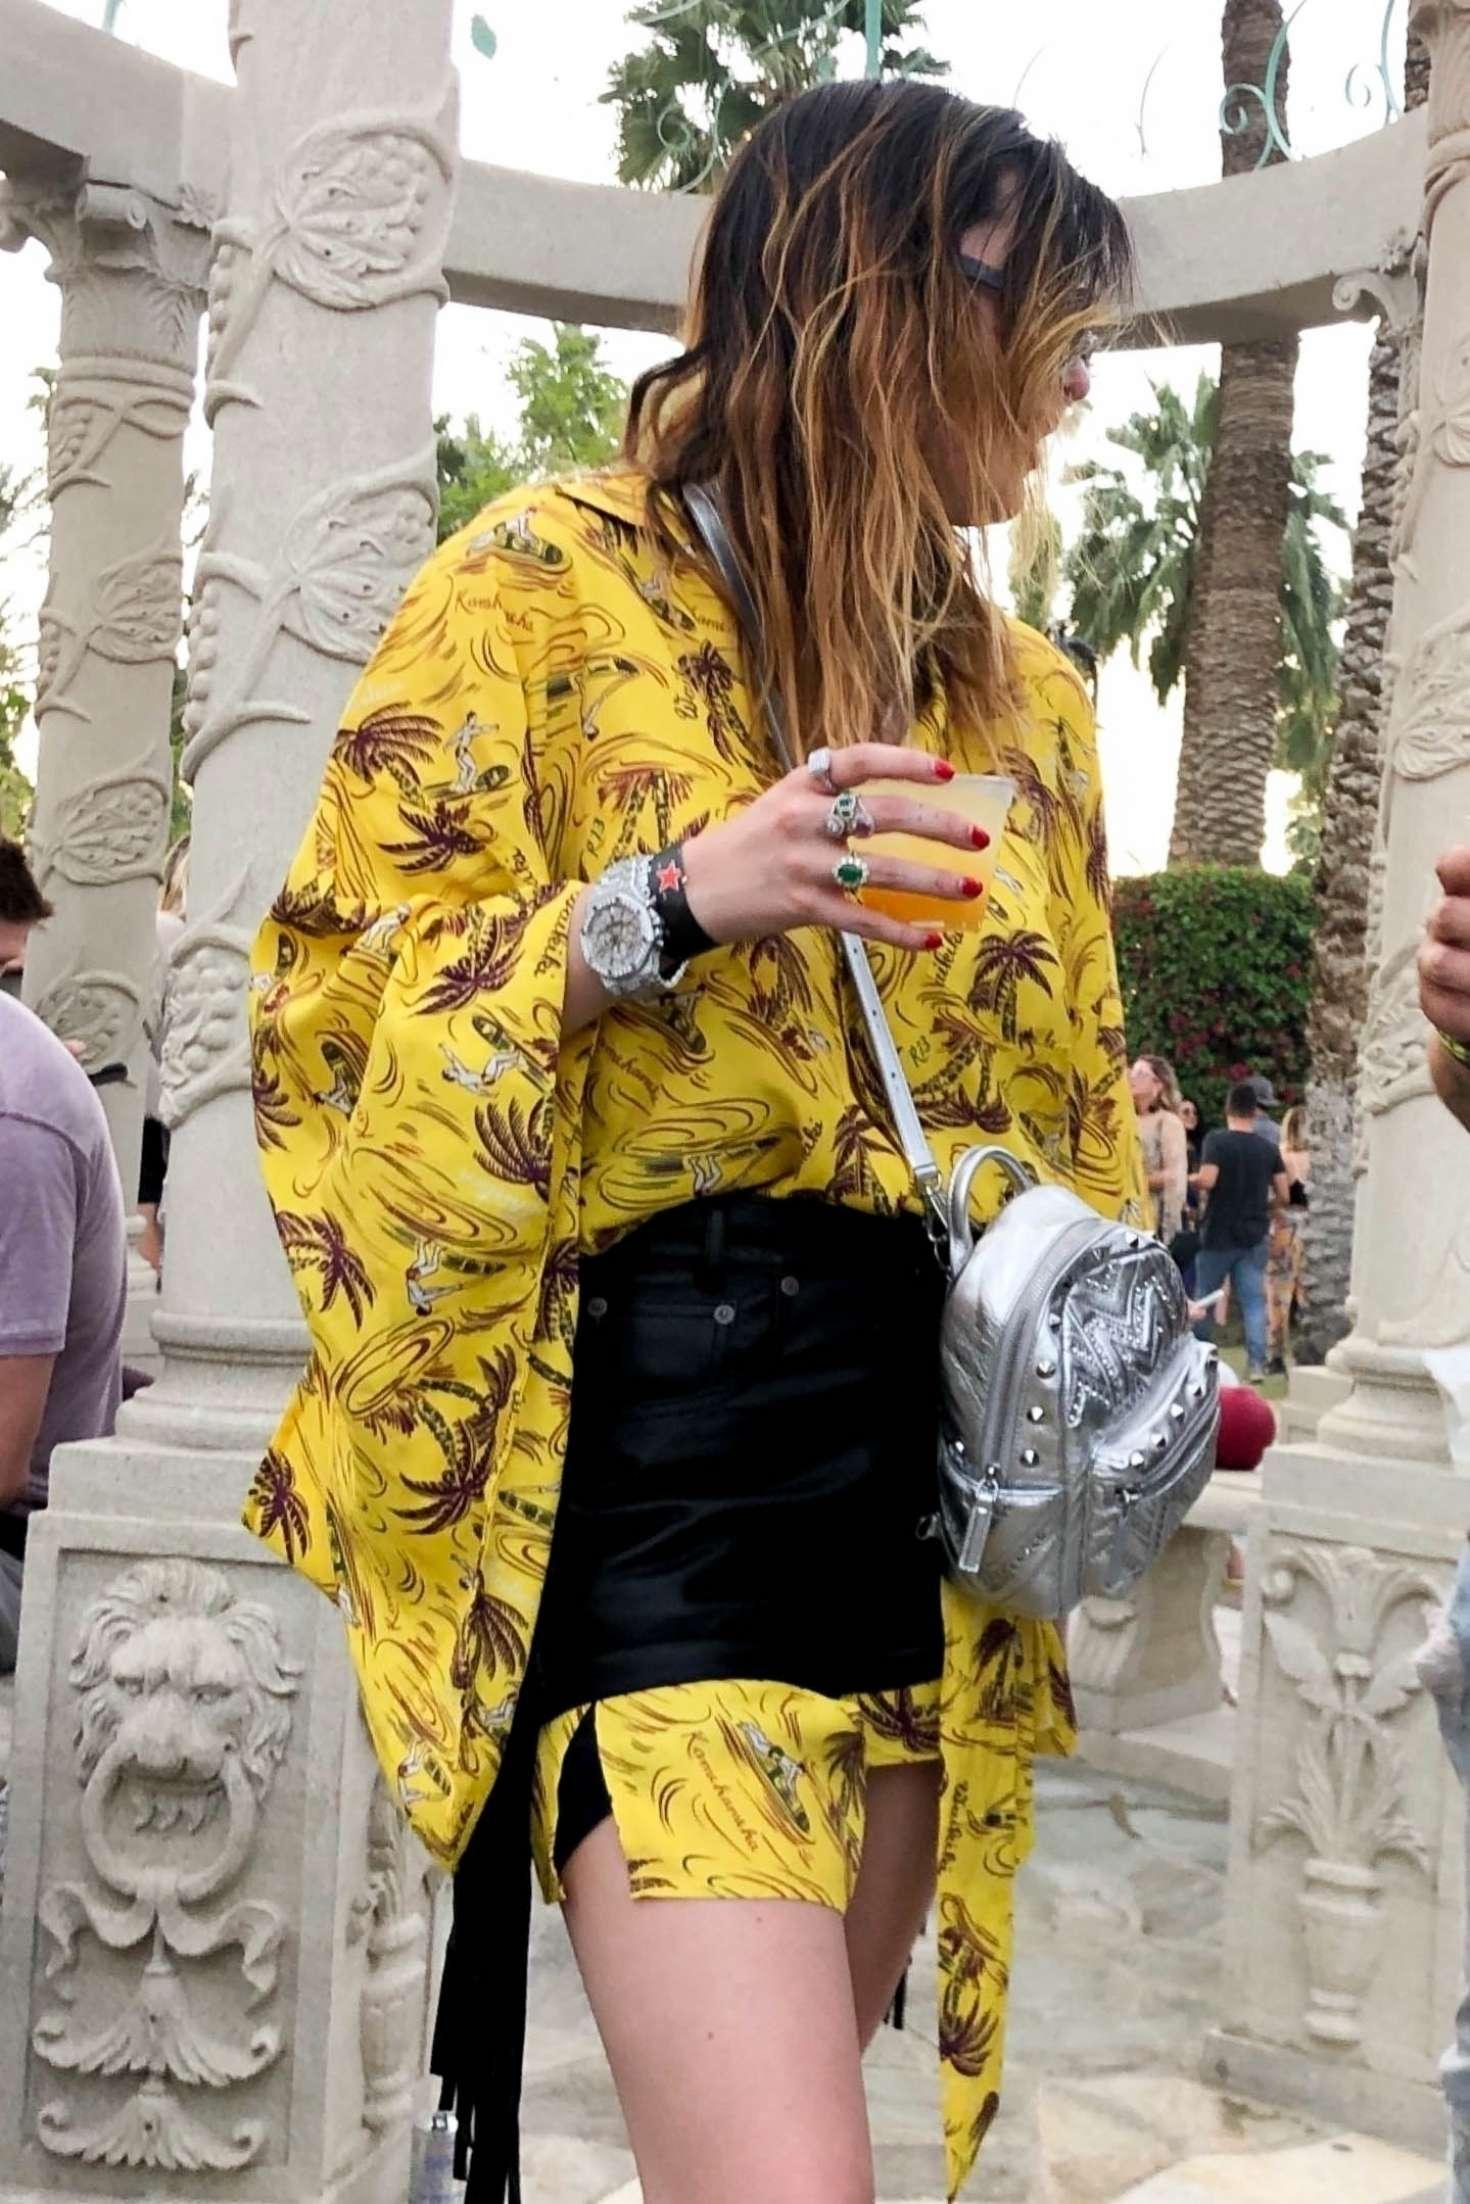 Bella Thorne 2019 : Bella Thorne at 2019 Coachella -14